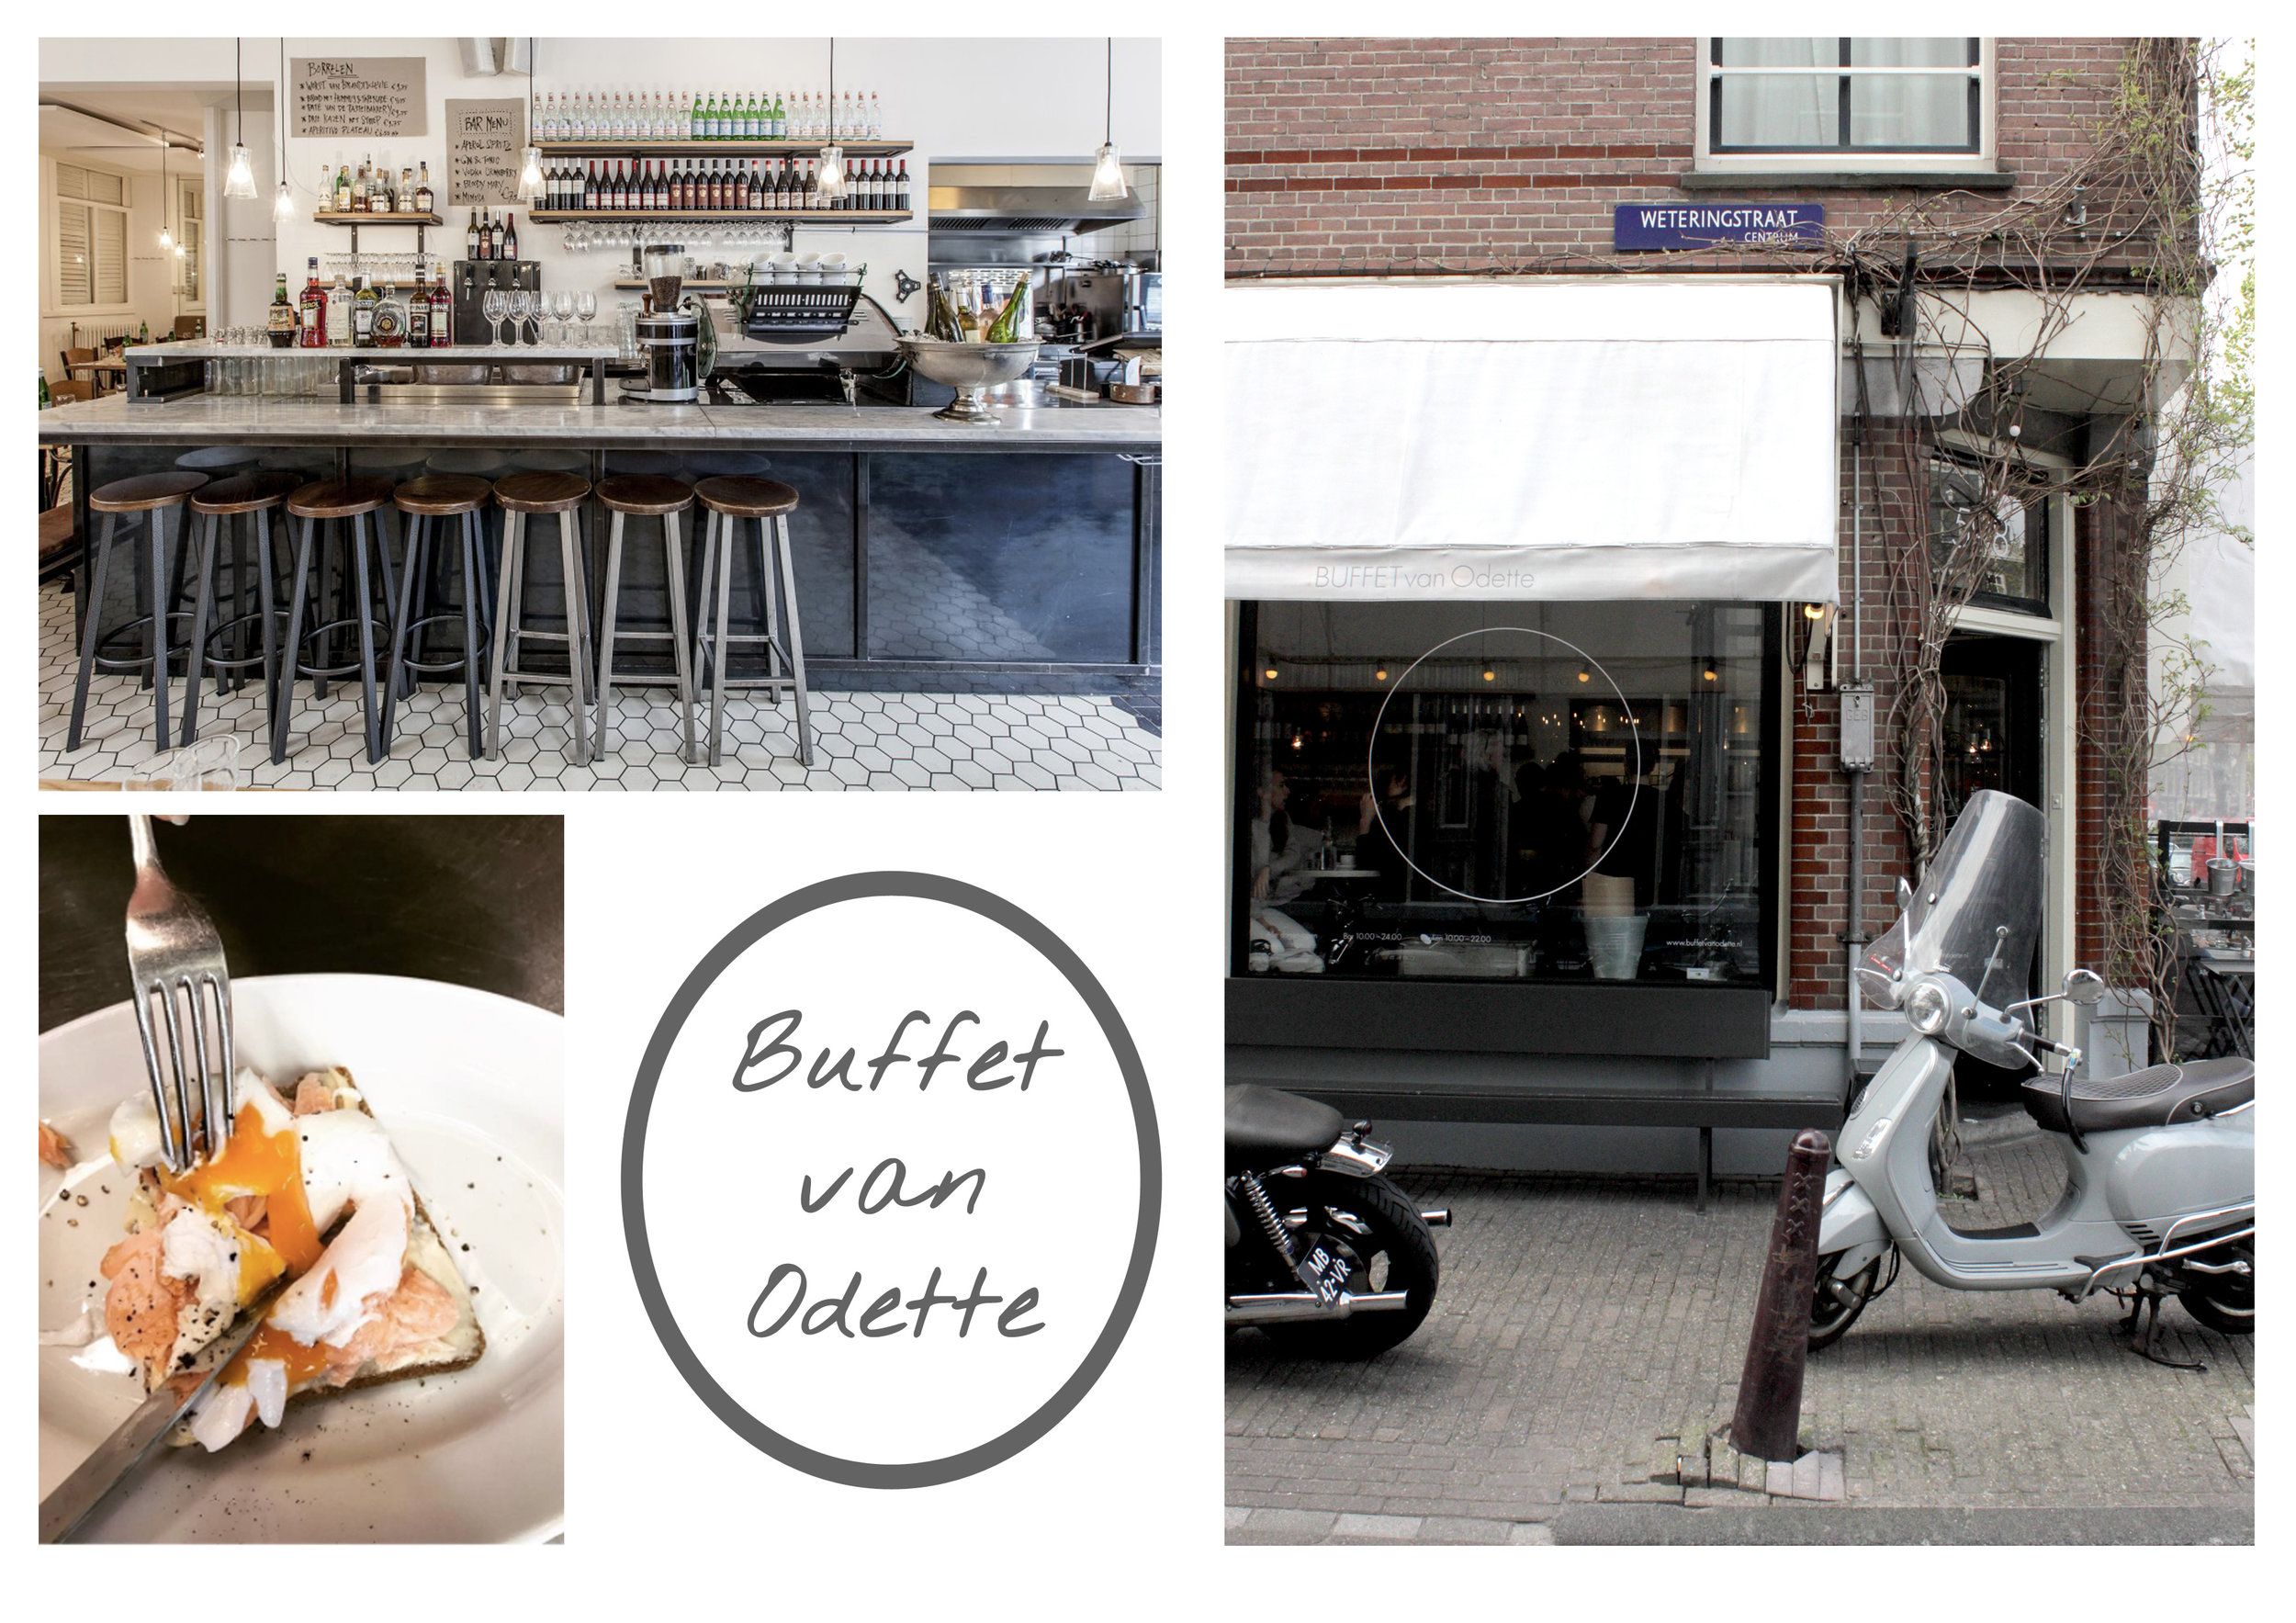 Photo's top left and bottom left by  Buffet van Odette